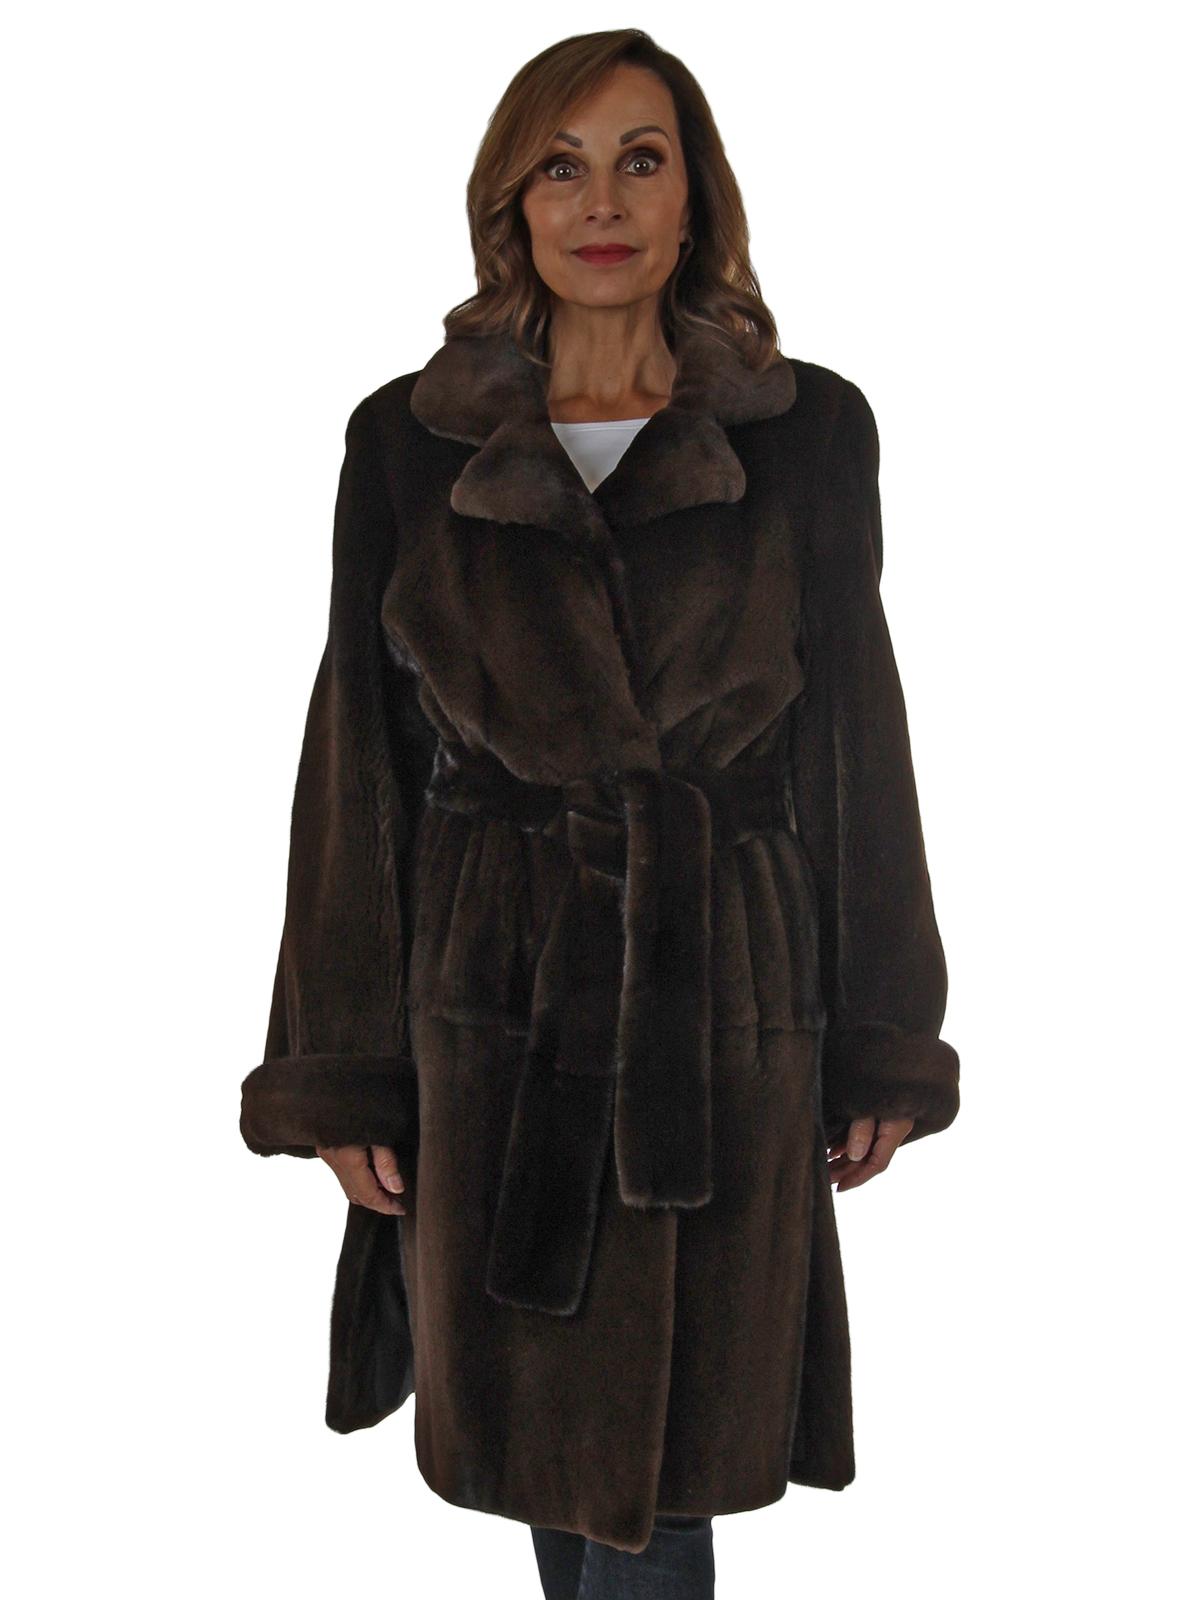 Woman's Chocolate Brown Semi-Sheared Mink Fur 7/8 Coat with Belt